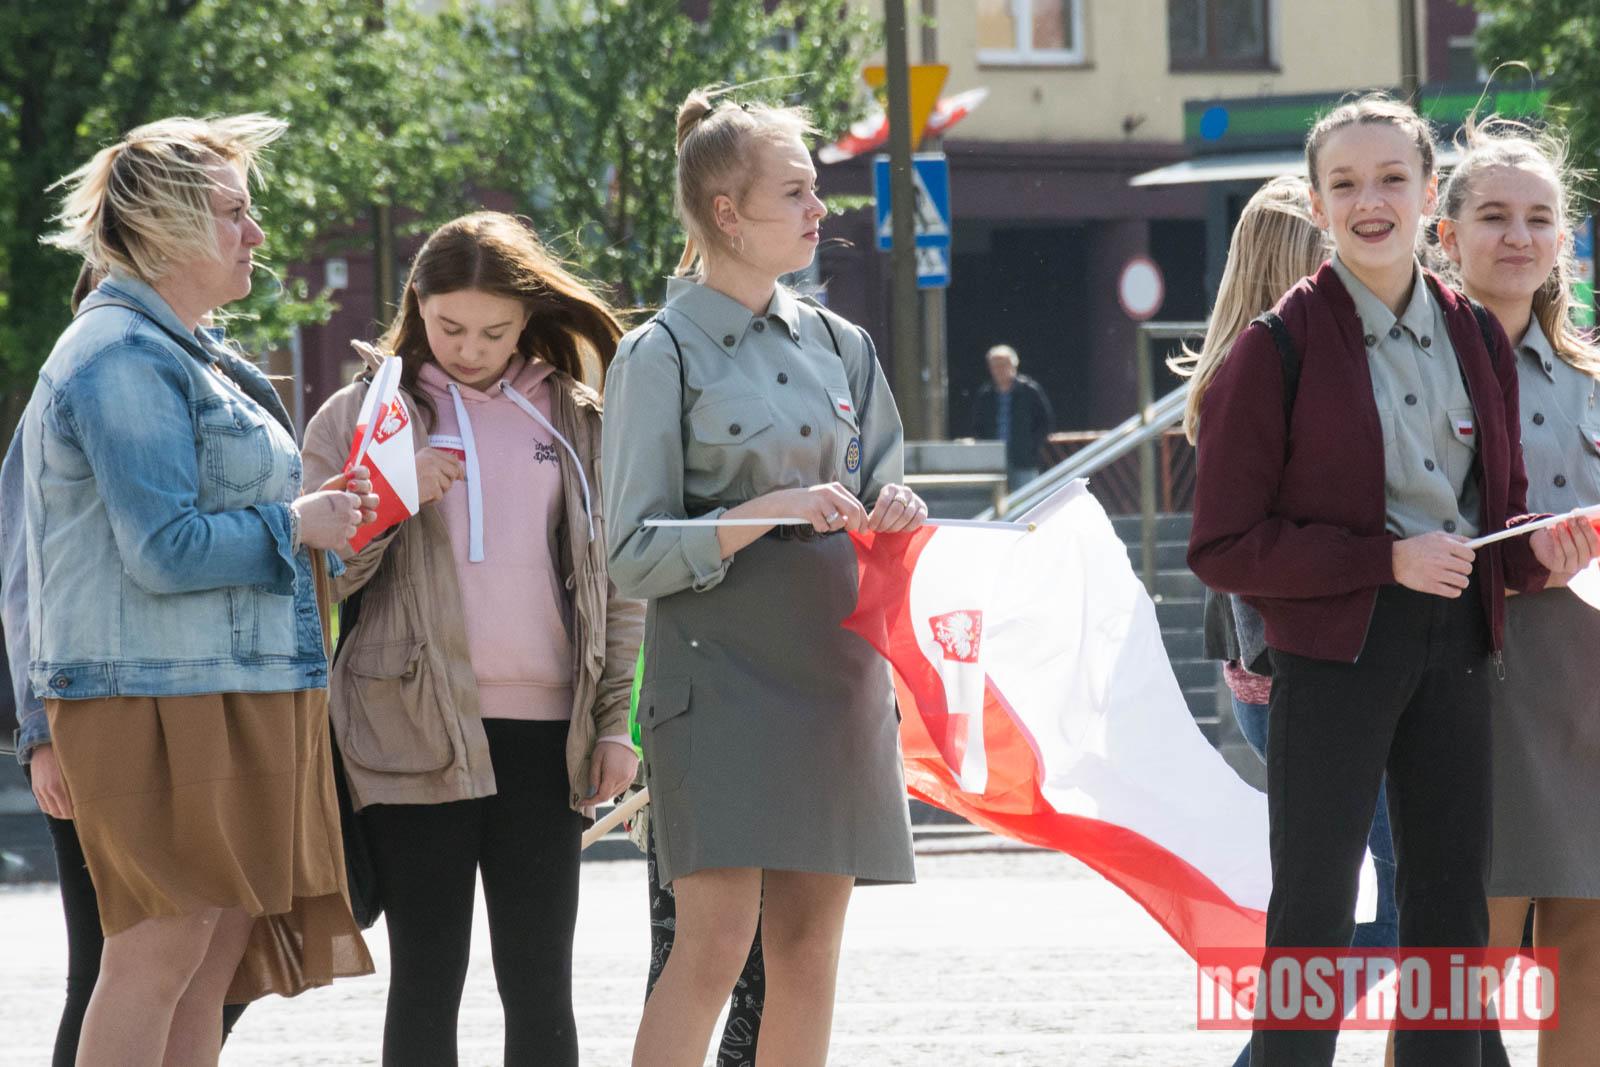 NaOSTRO dzien flagi rynek-20